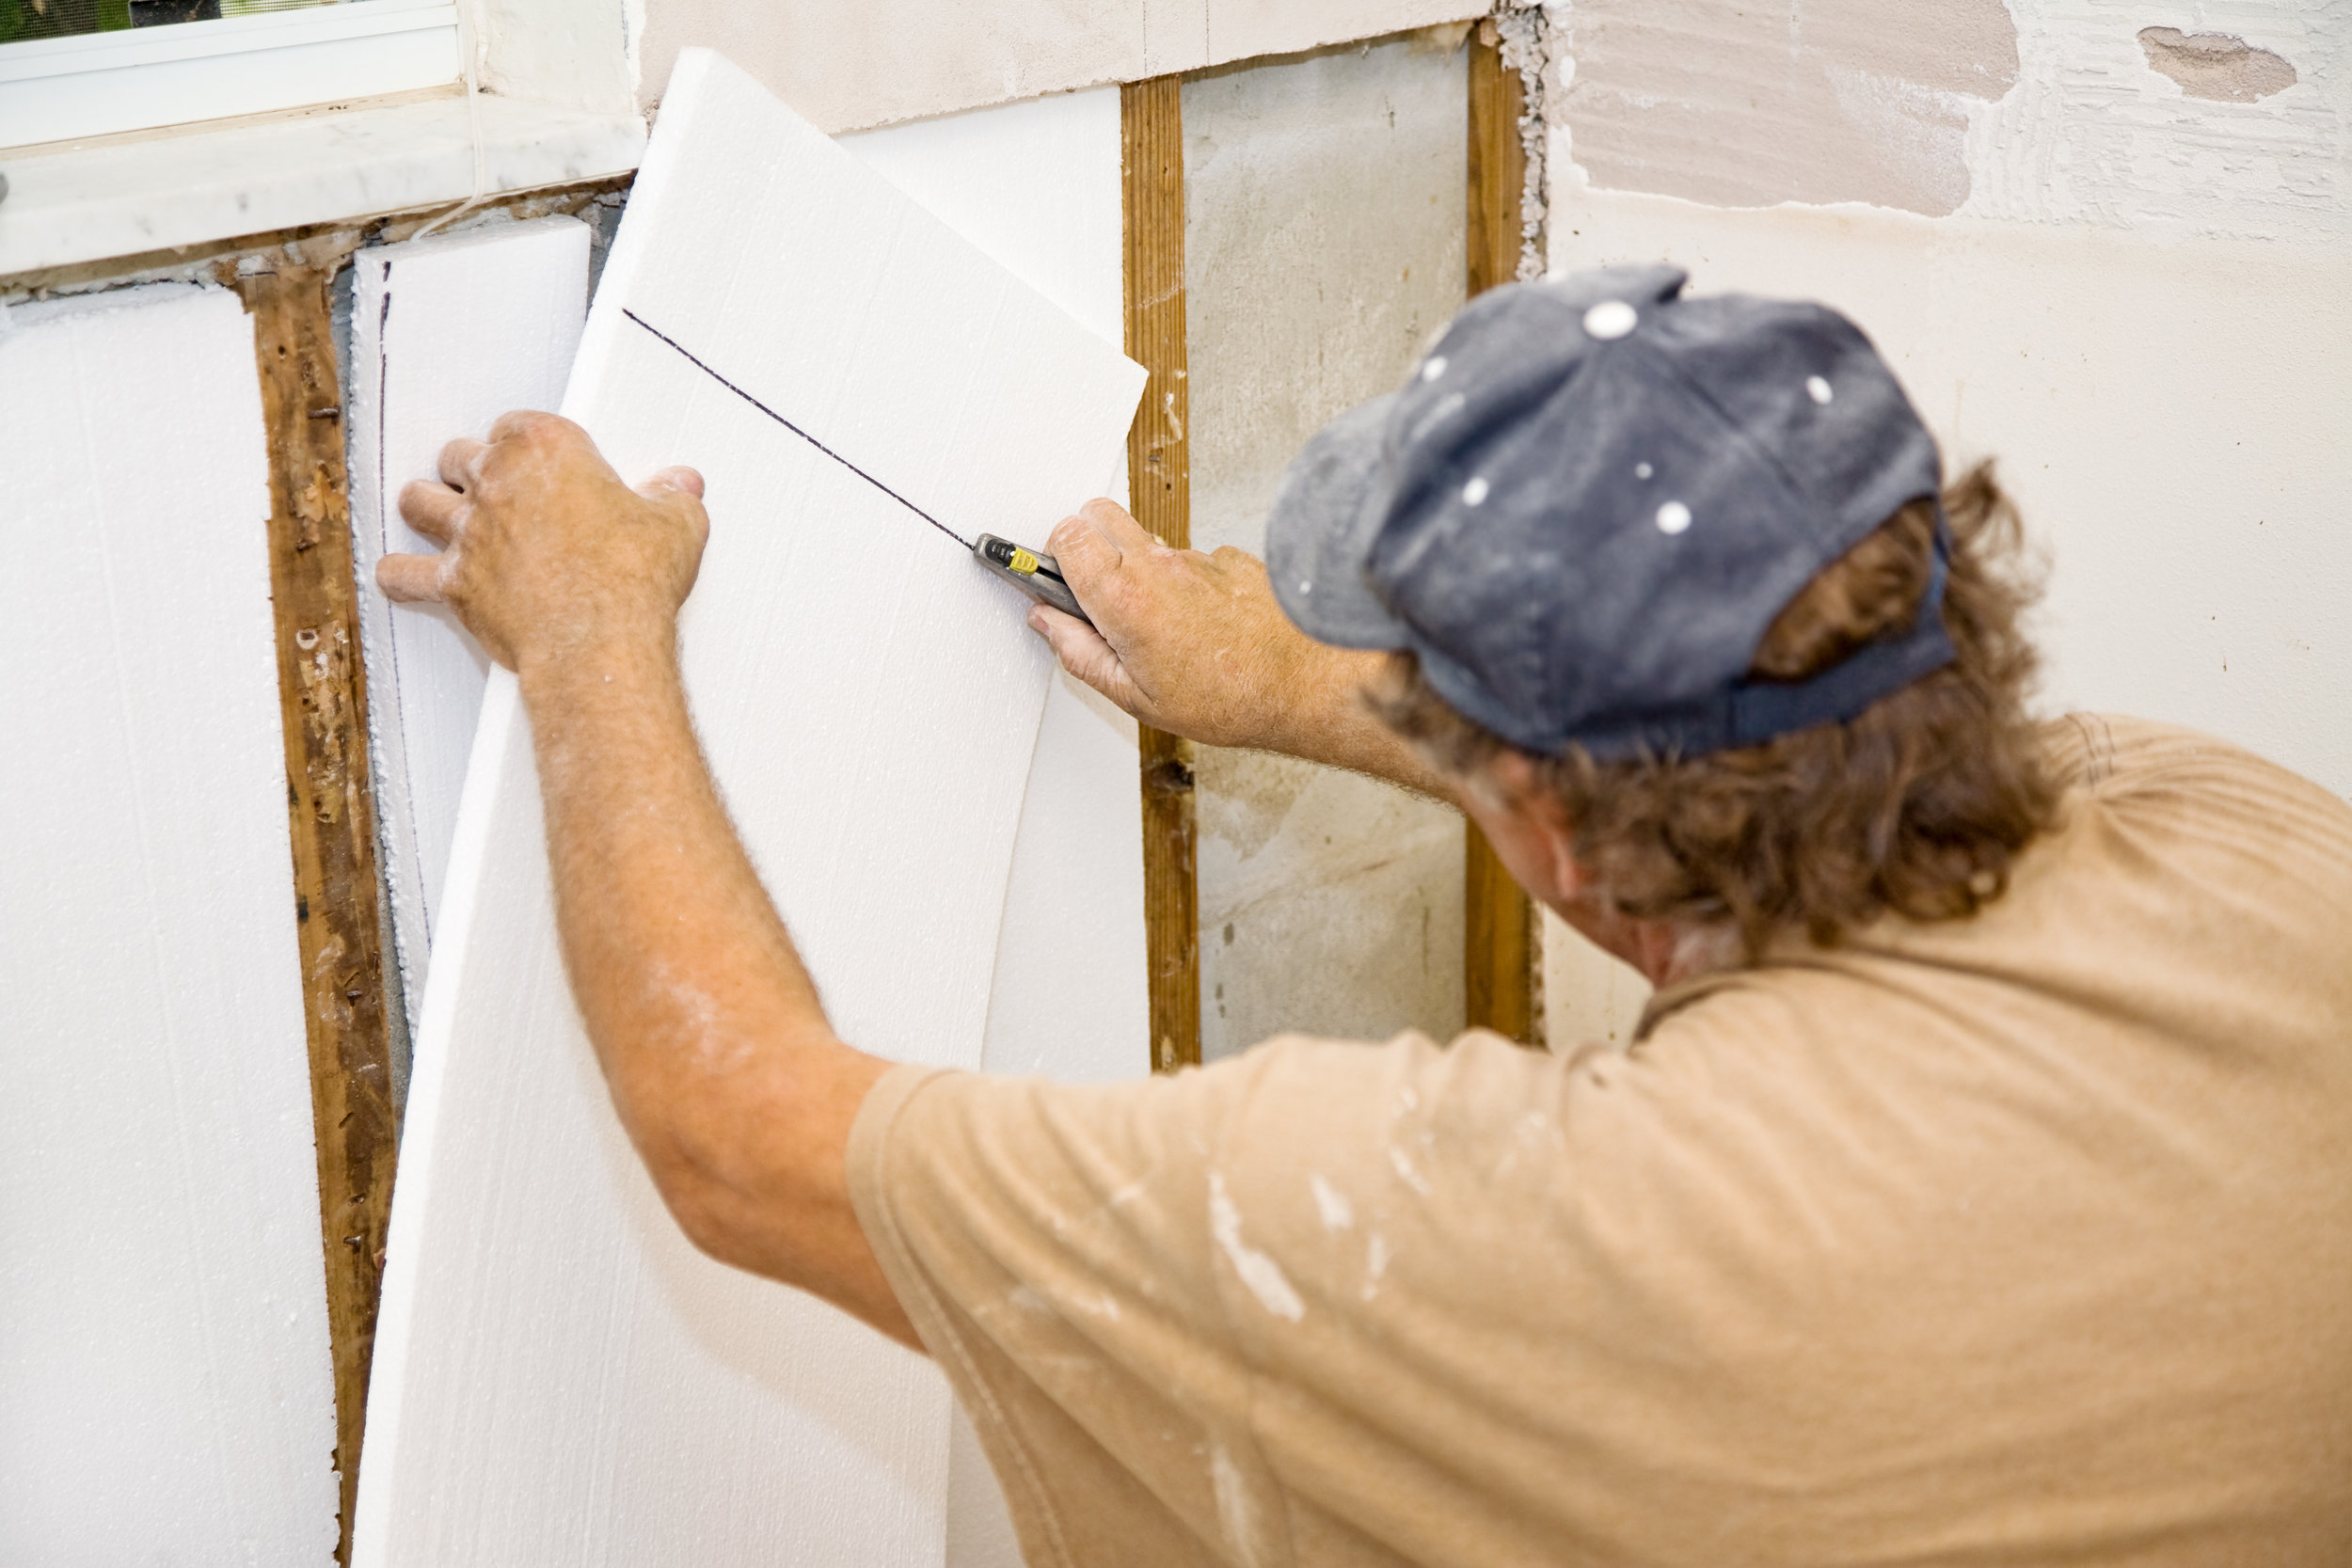 Interior Design and Contractor Services